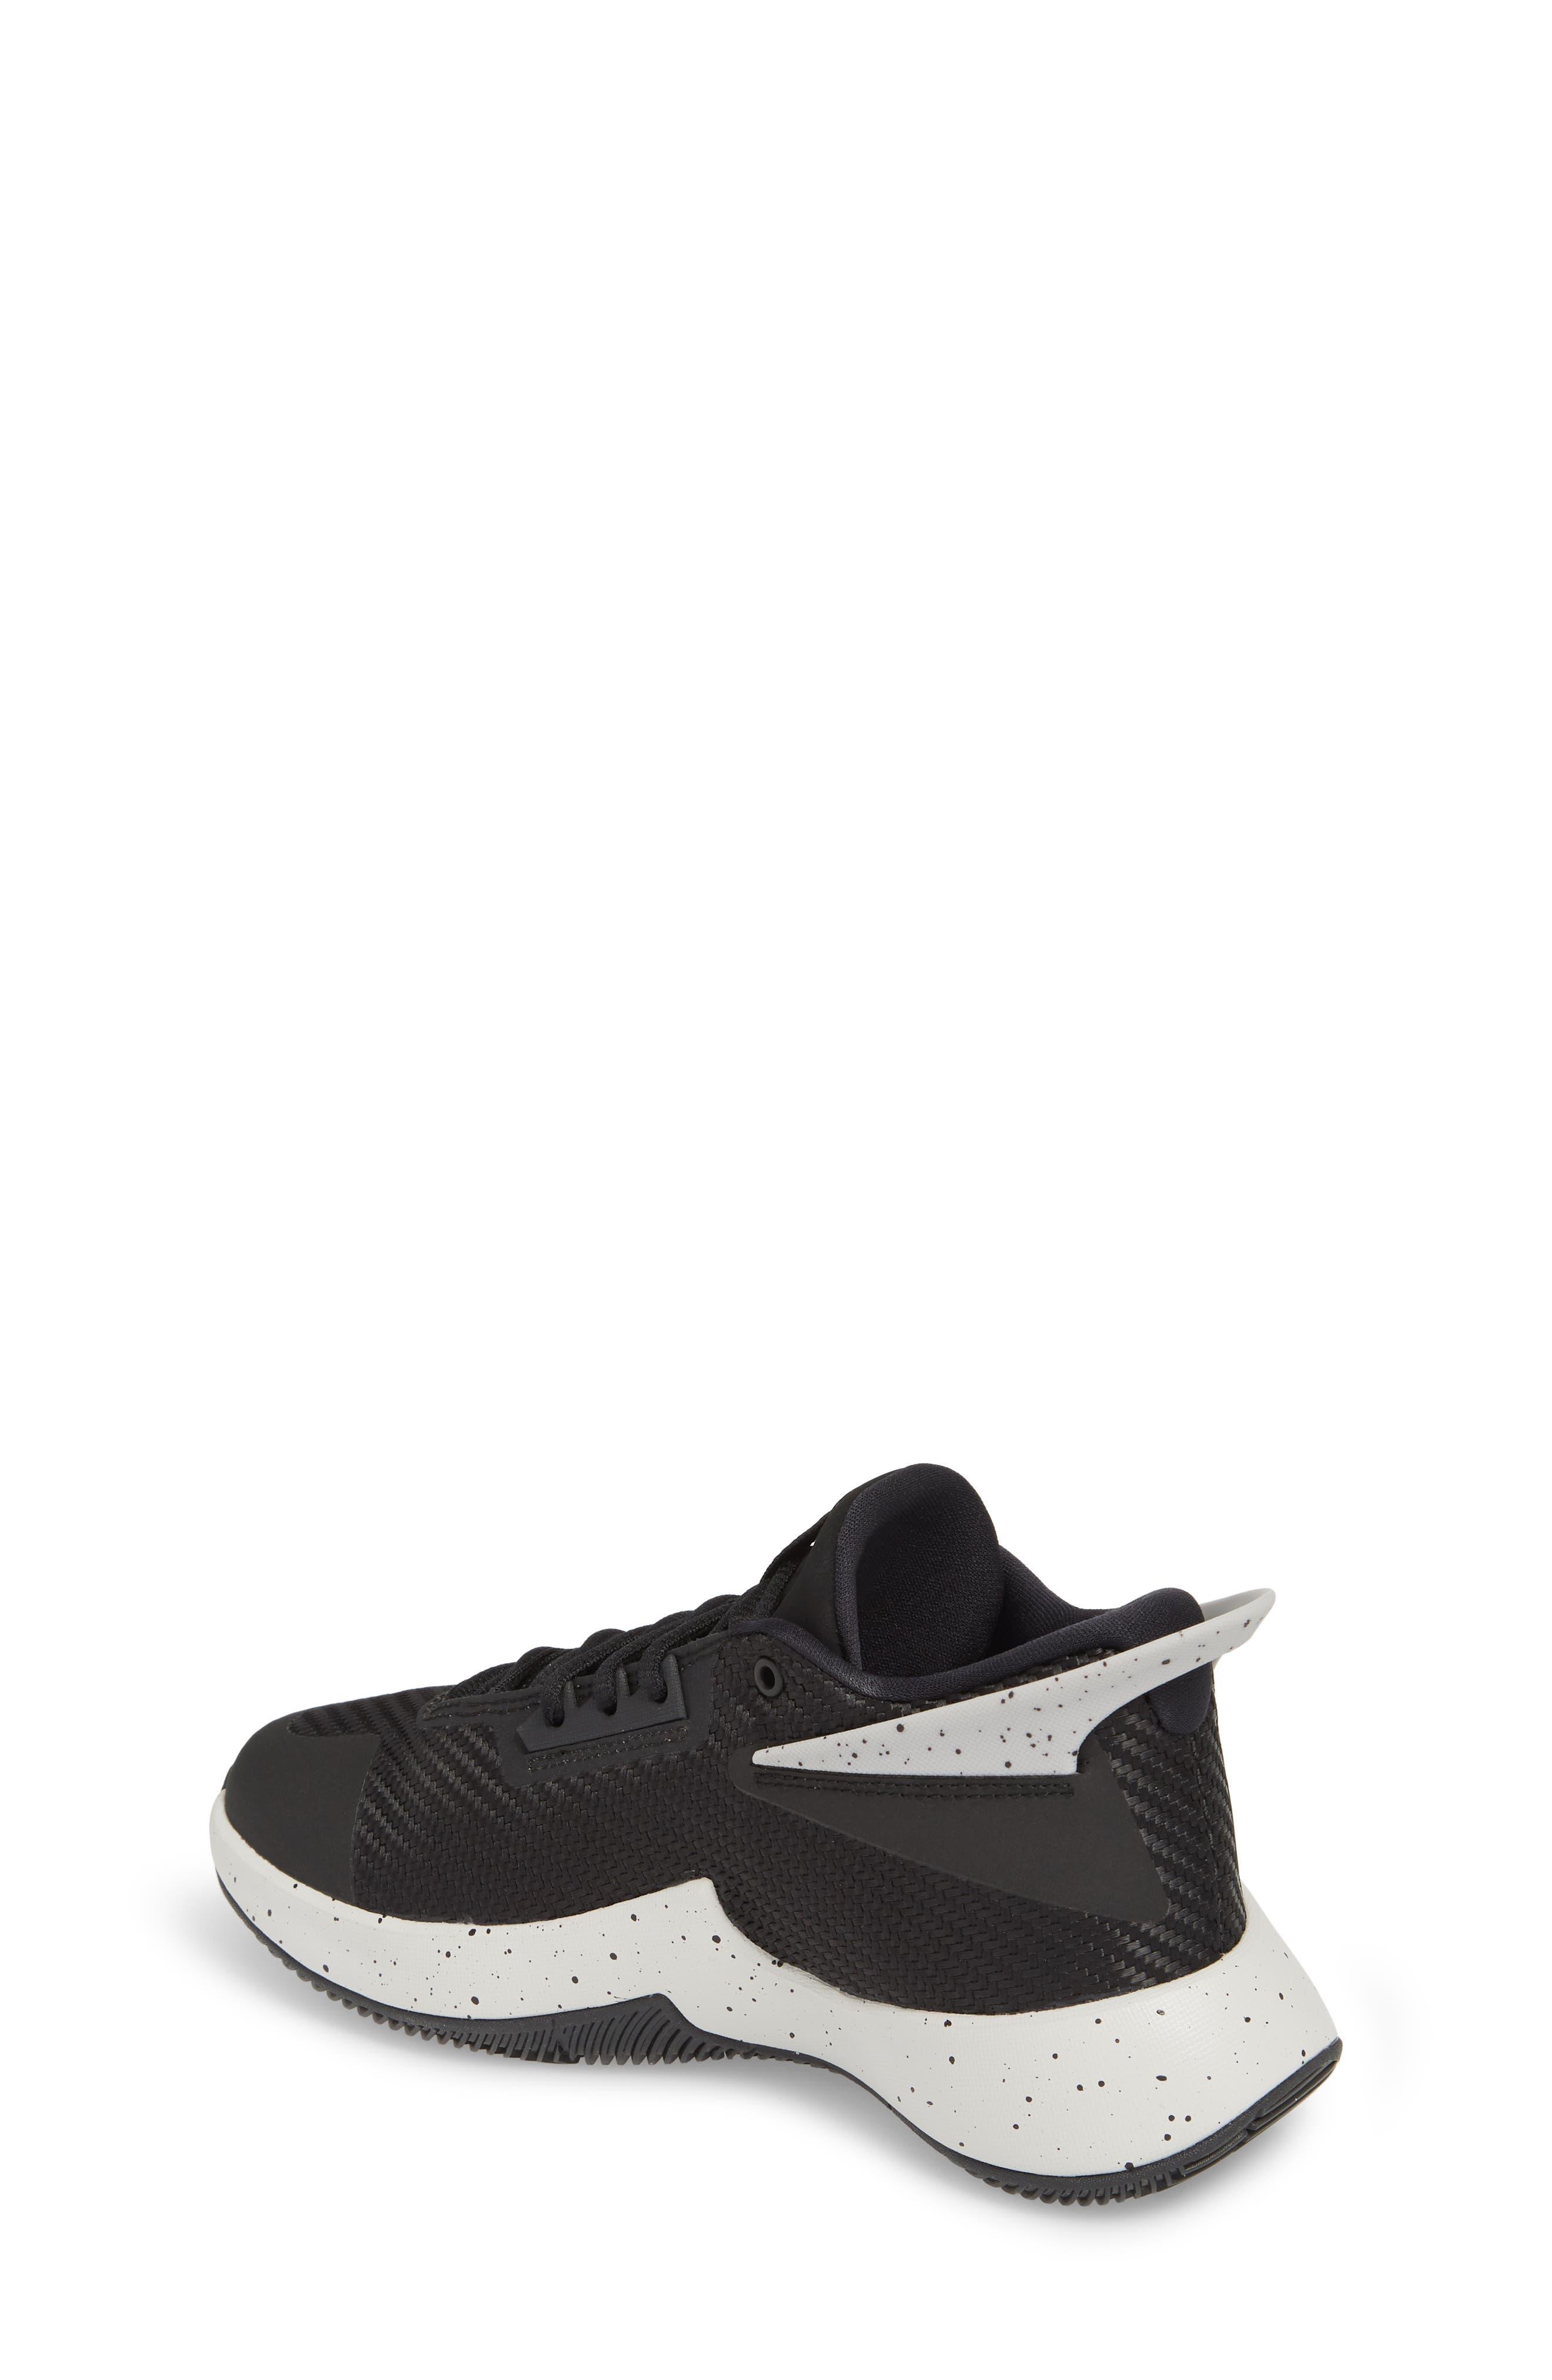 JORDAN,                             Nike Jordan Fly Lockdown Sneaker,                             Alternate thumbnail 2, color,                             010